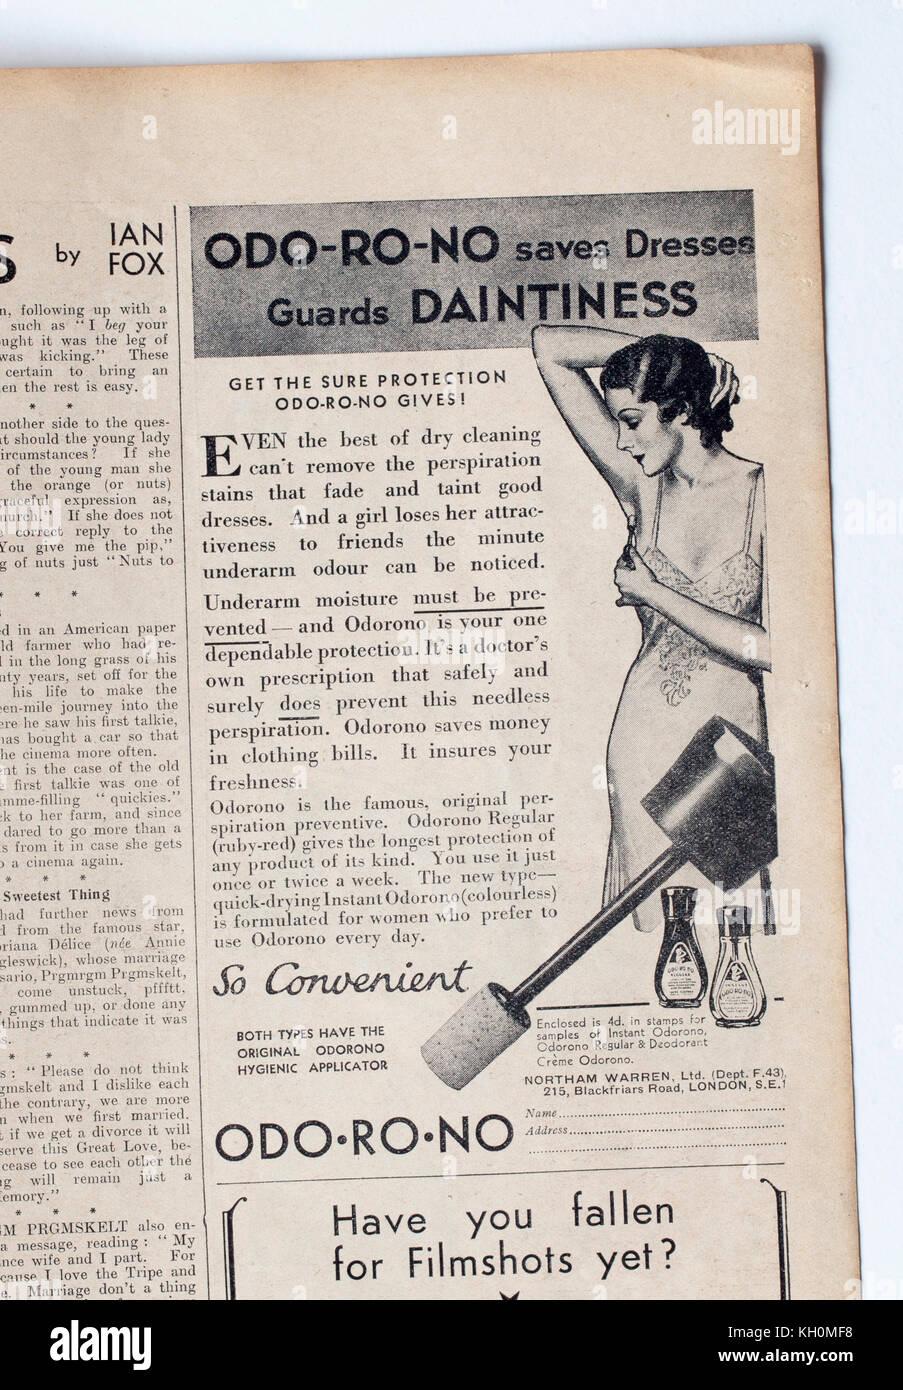 1950s Advertising for Odo Ro No deodorant - Stock Image